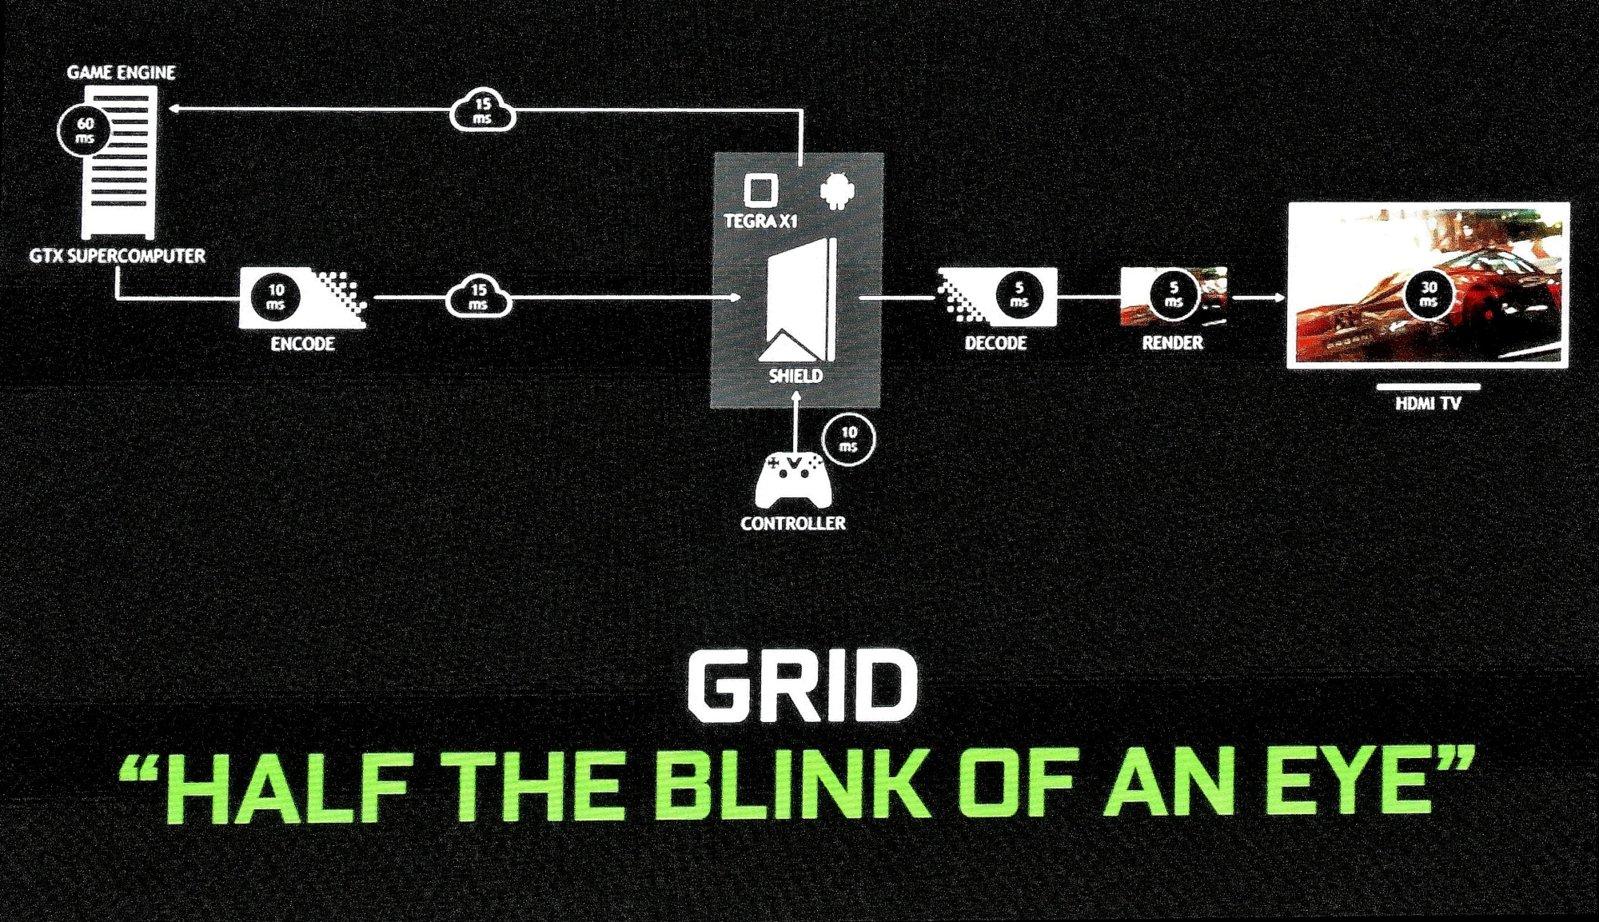 Nvidia_Grid-1b4540dcd3ebc39d.jpeg